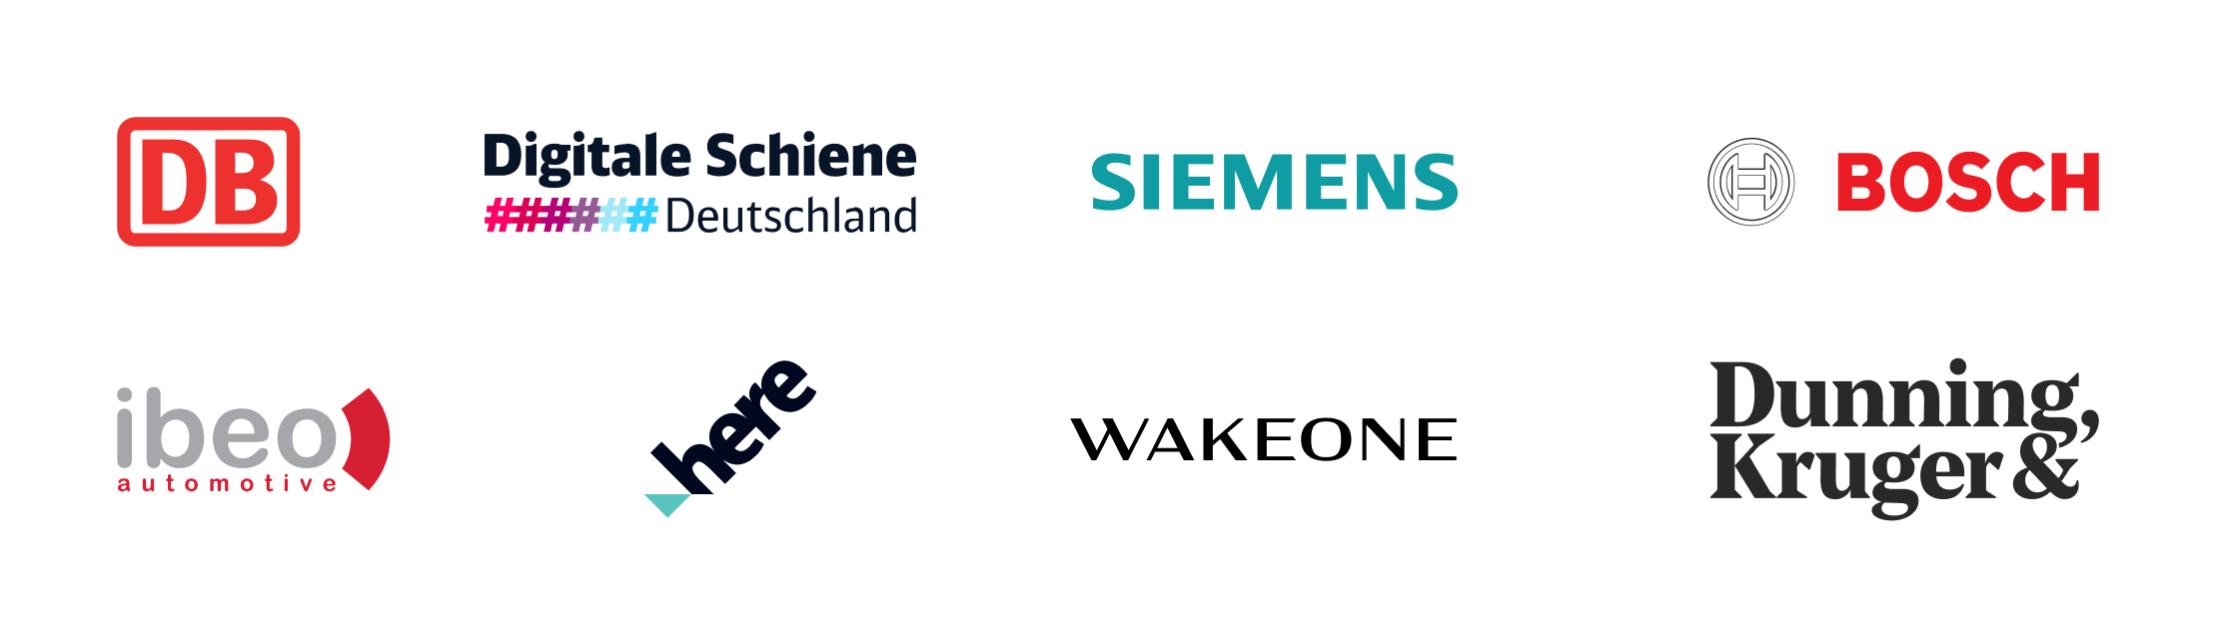 Partner logos: Deutsche Bahn, Siemens, Bosch, Ibeo, HERE Technologies, Wakeone